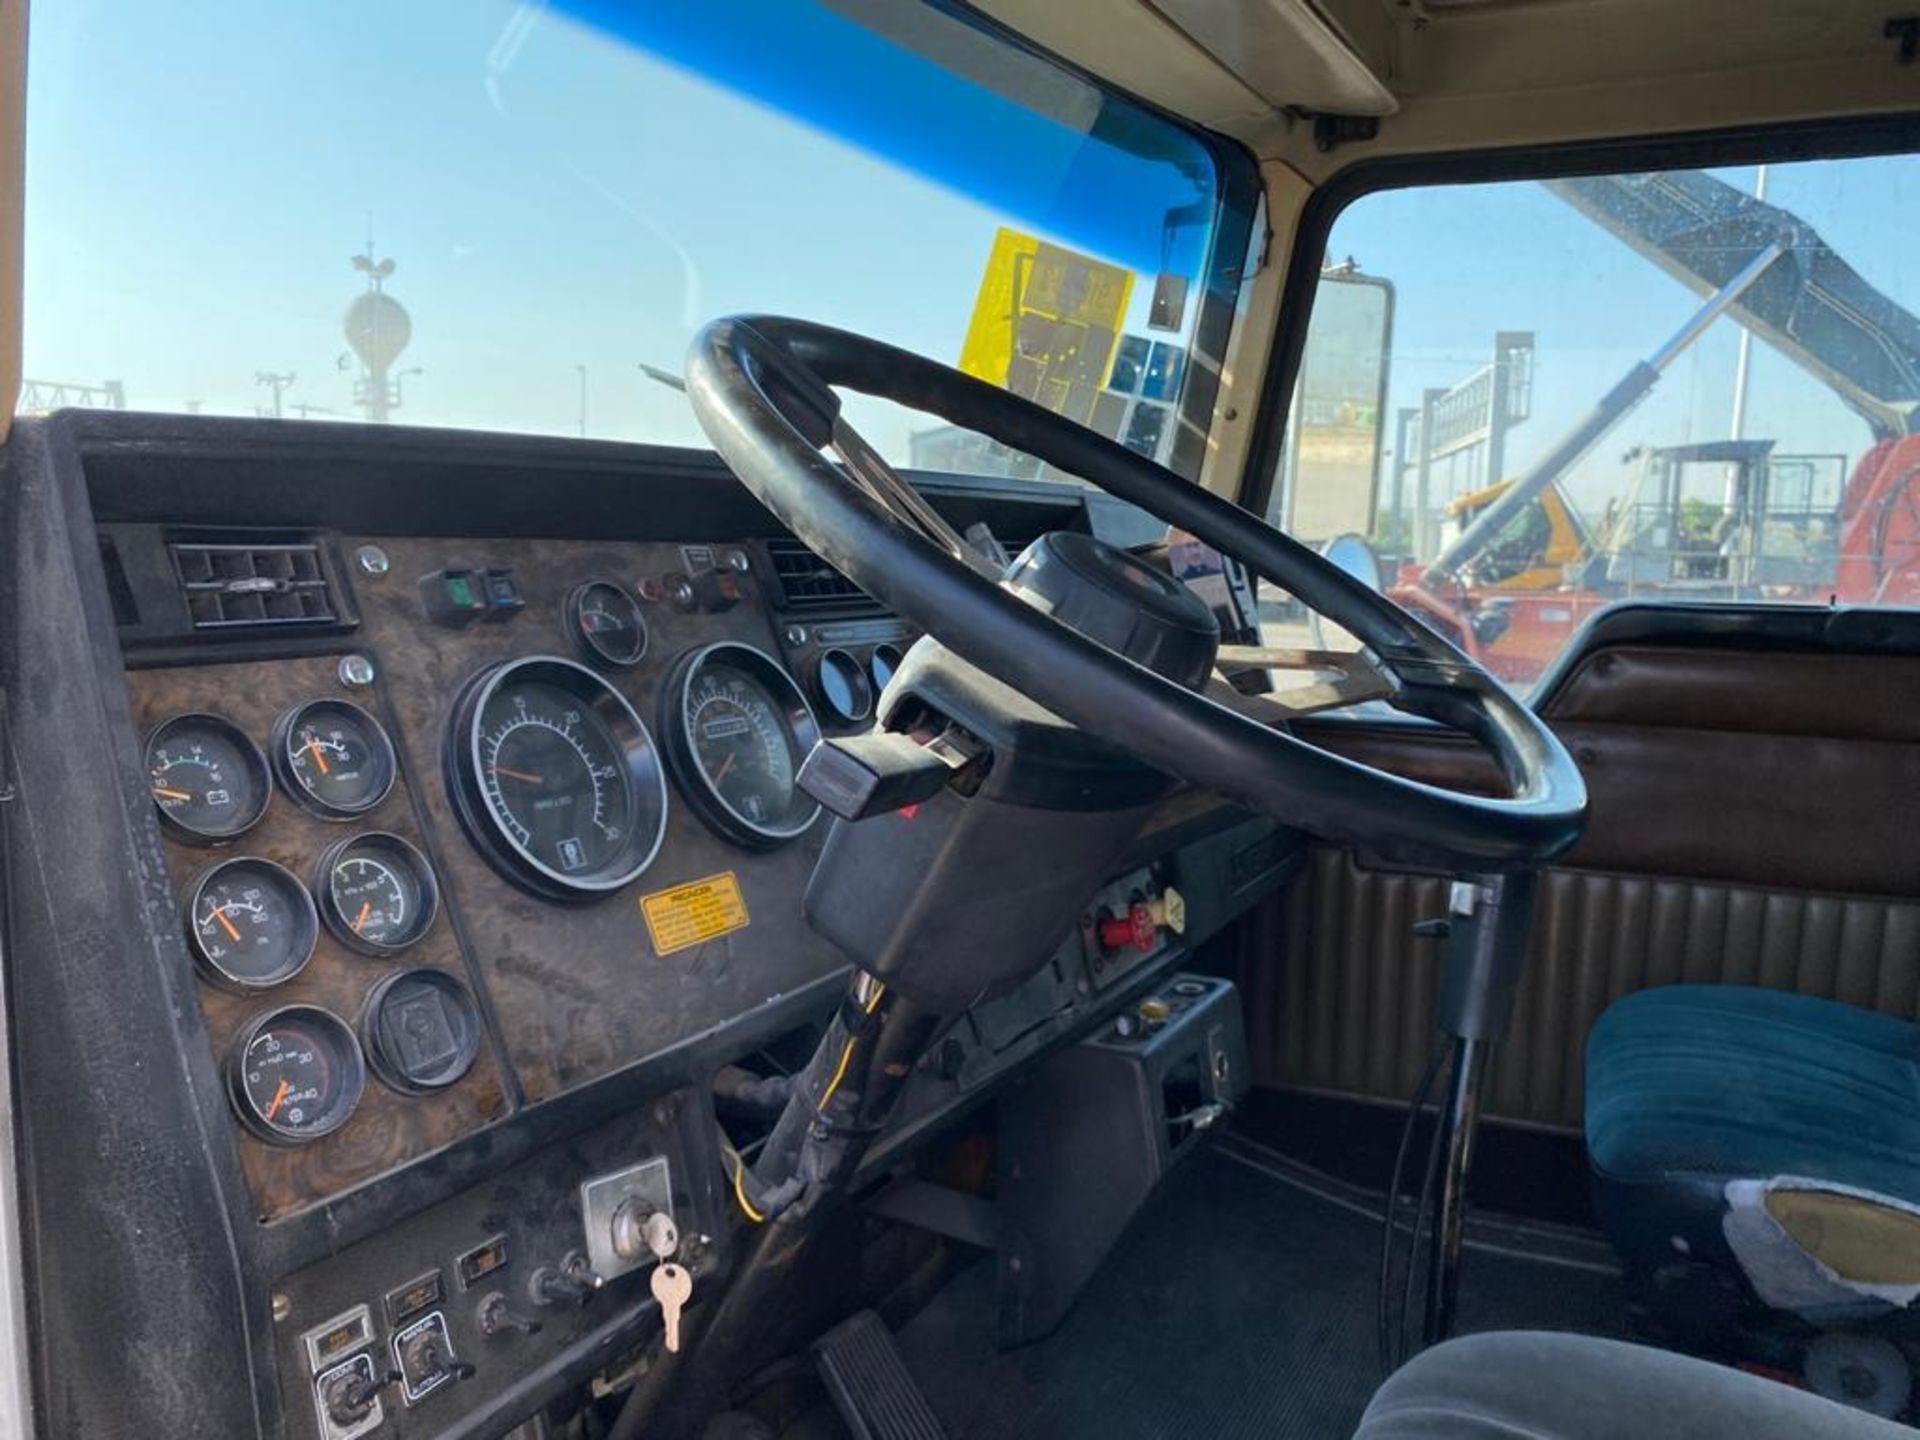 1998 Kenworth Sleeper Truck Tractor, standard transmission of 18 speeds - Image 37 of 55